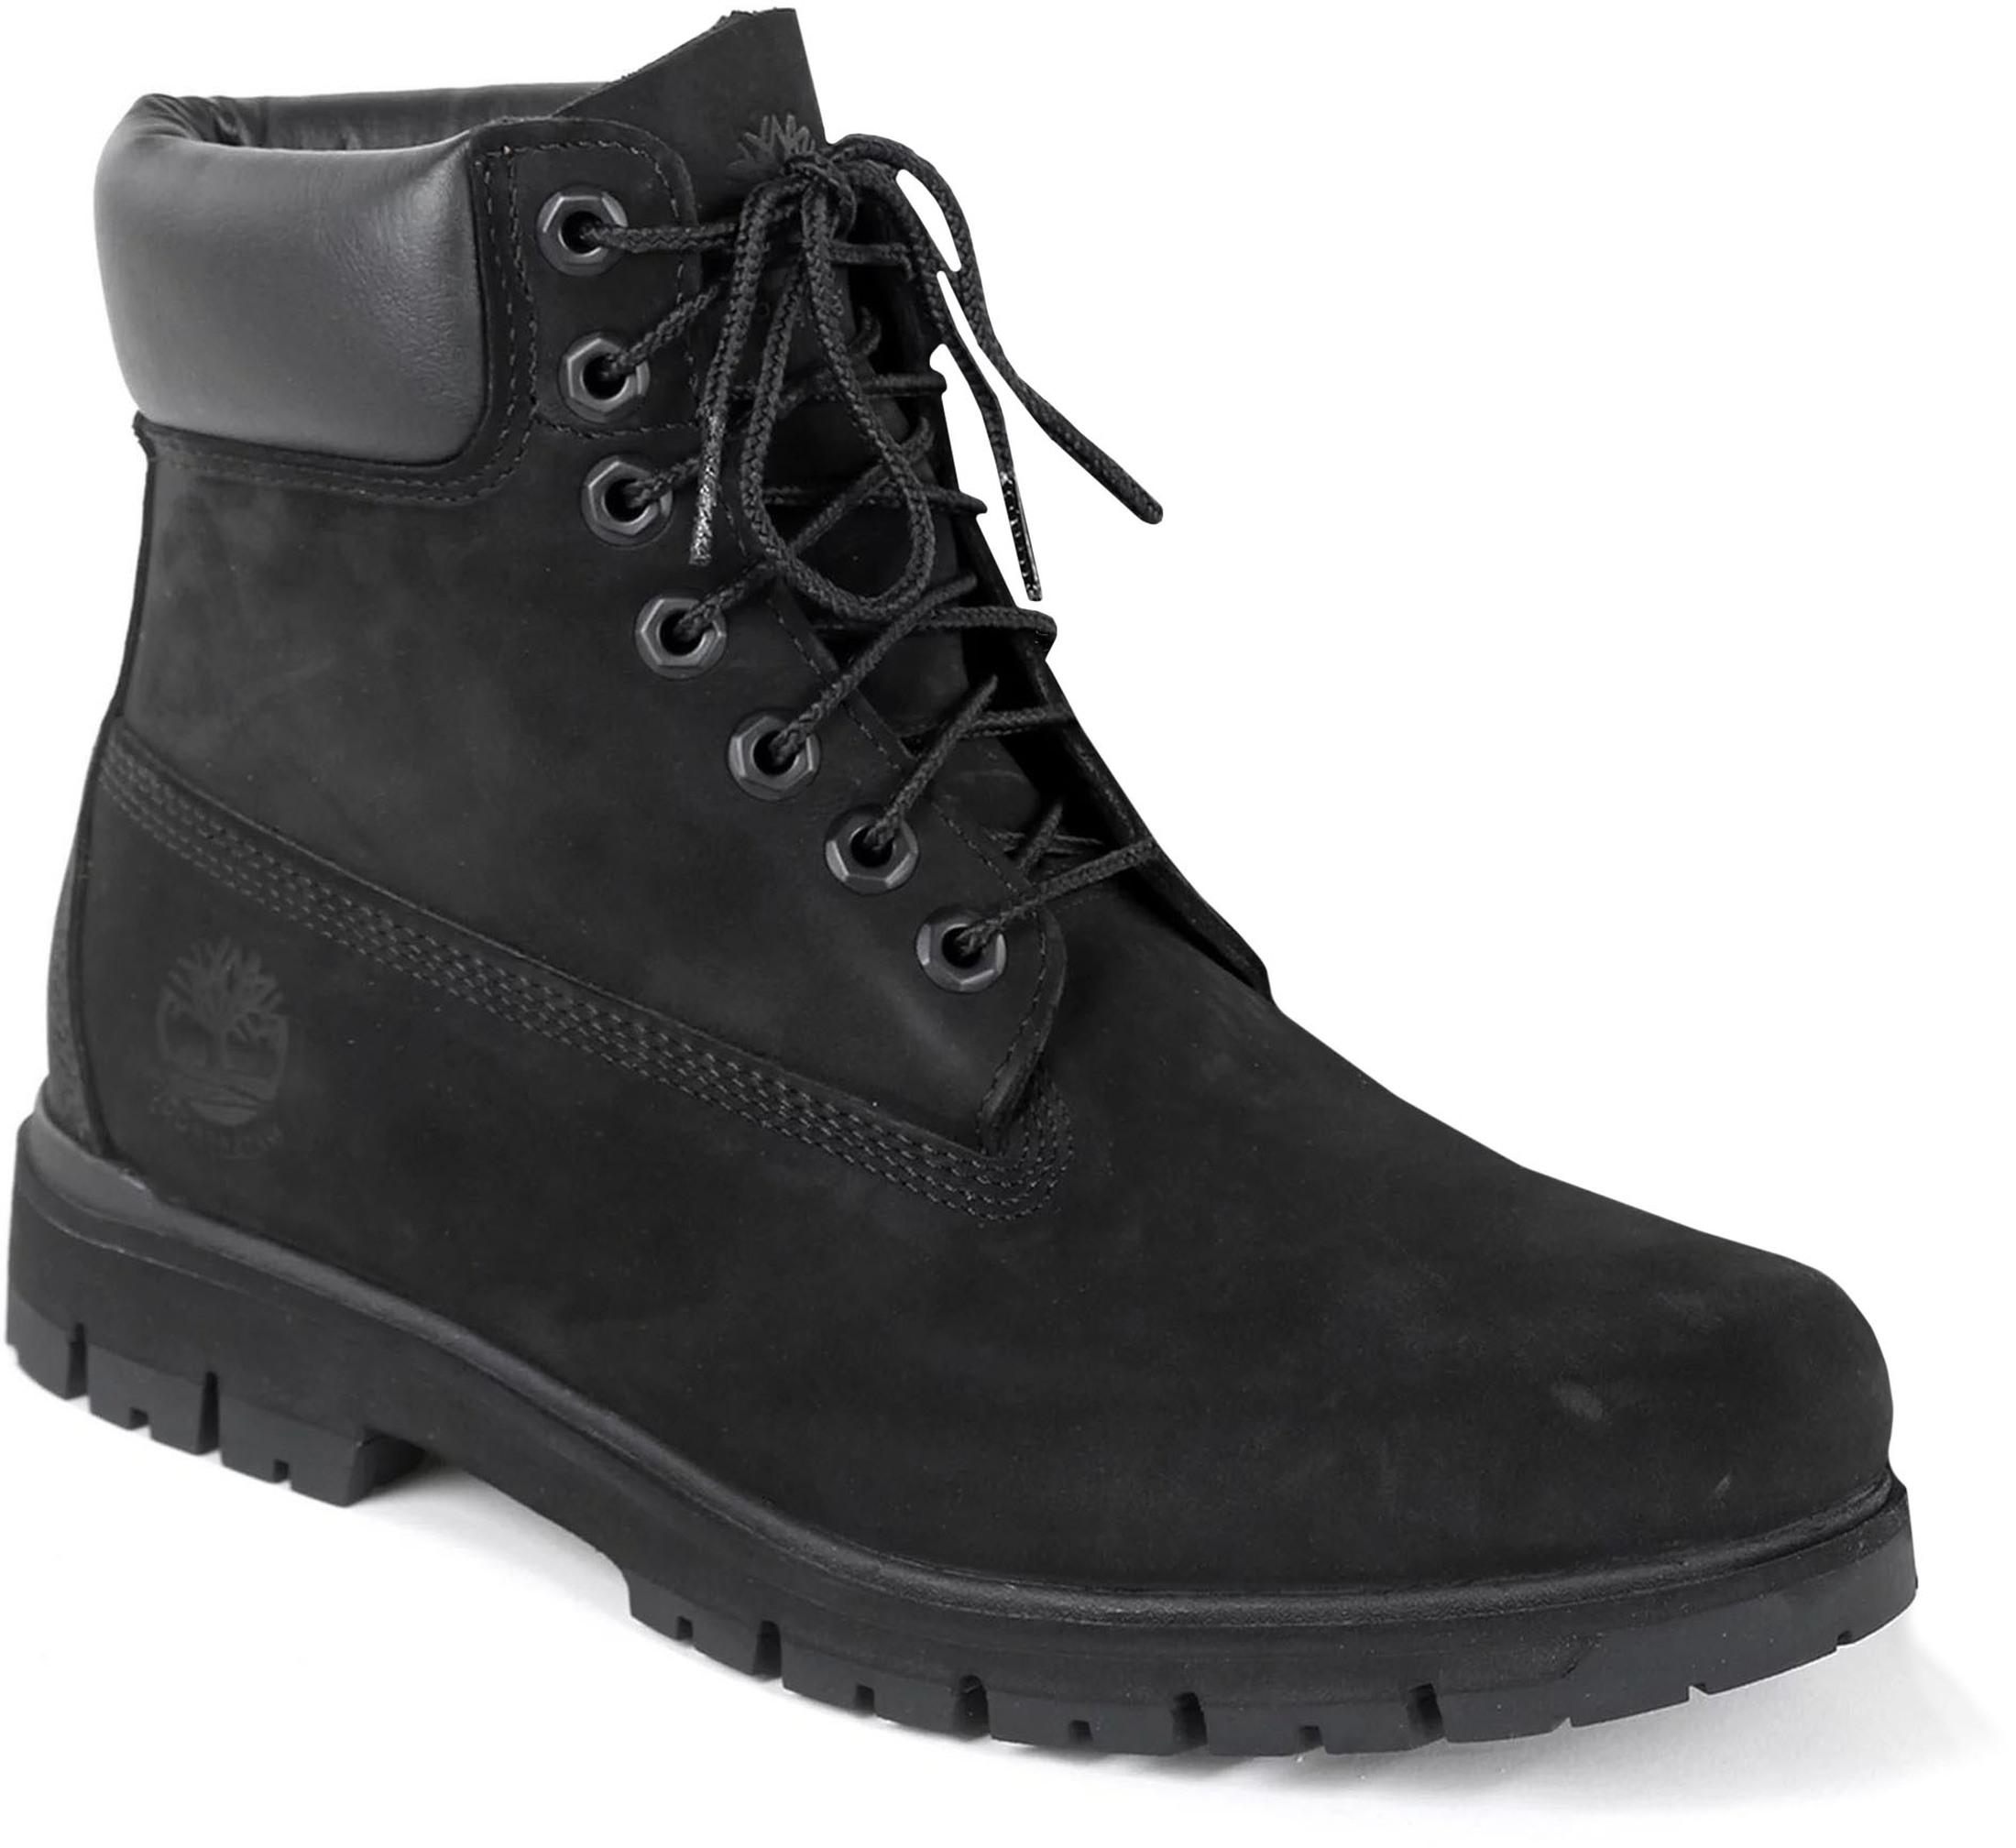 new products cf4df 20ca7 Timberland Radfort 6-Inch Boots Schwarz CA1JI2 online kaufen ...